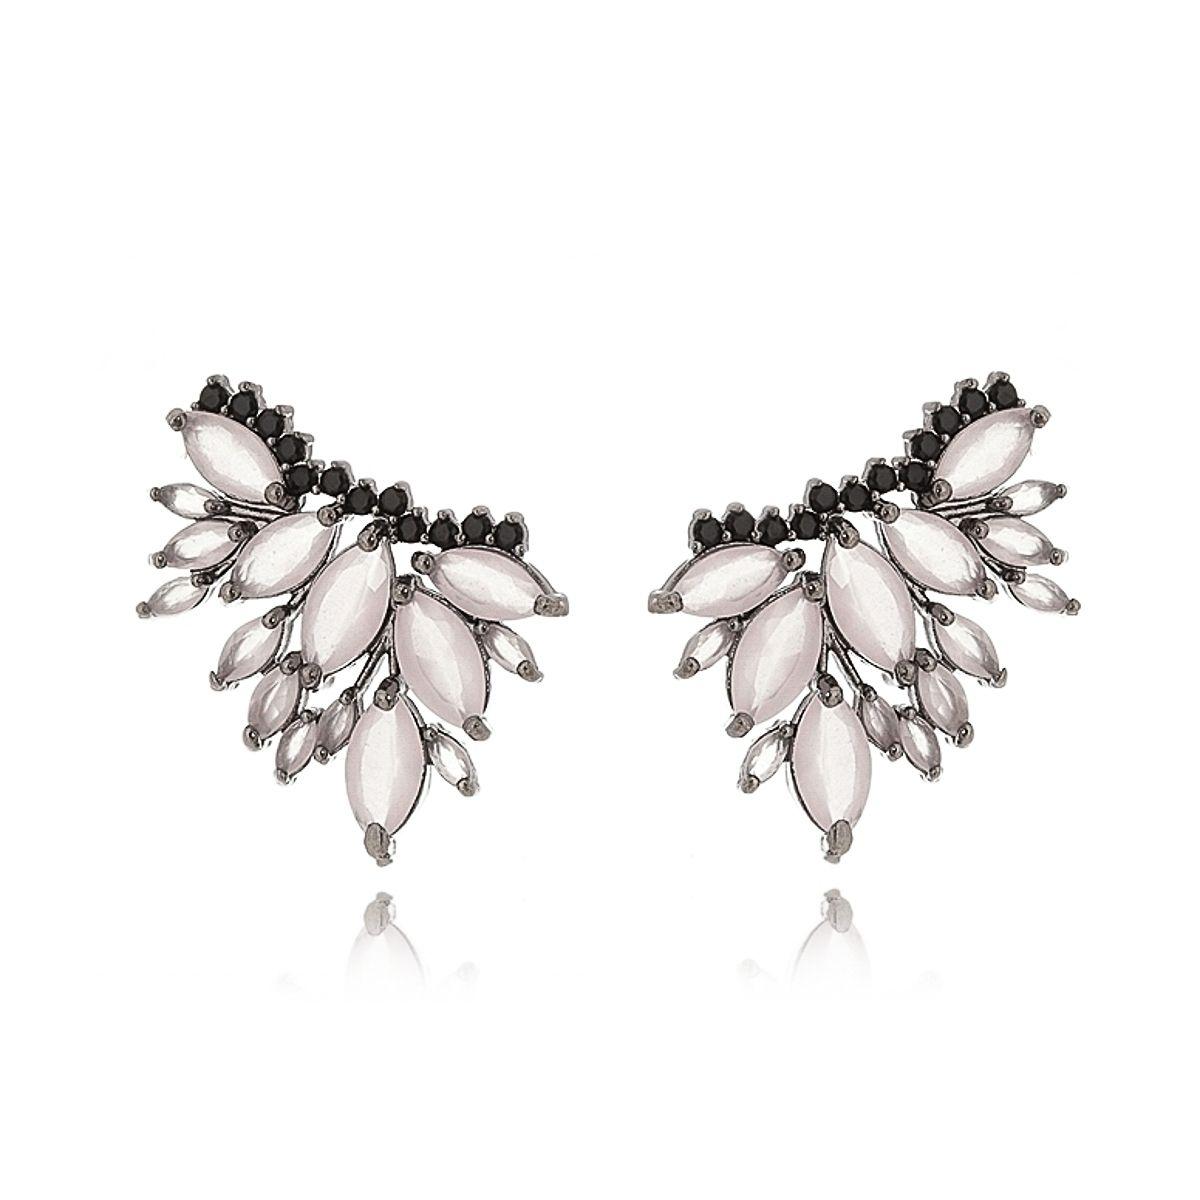 Ear Cuff Quartzo Rosa com Micro Zircônia Preta Semijoia Fashion em Ródio Negro  - SOLOYOU